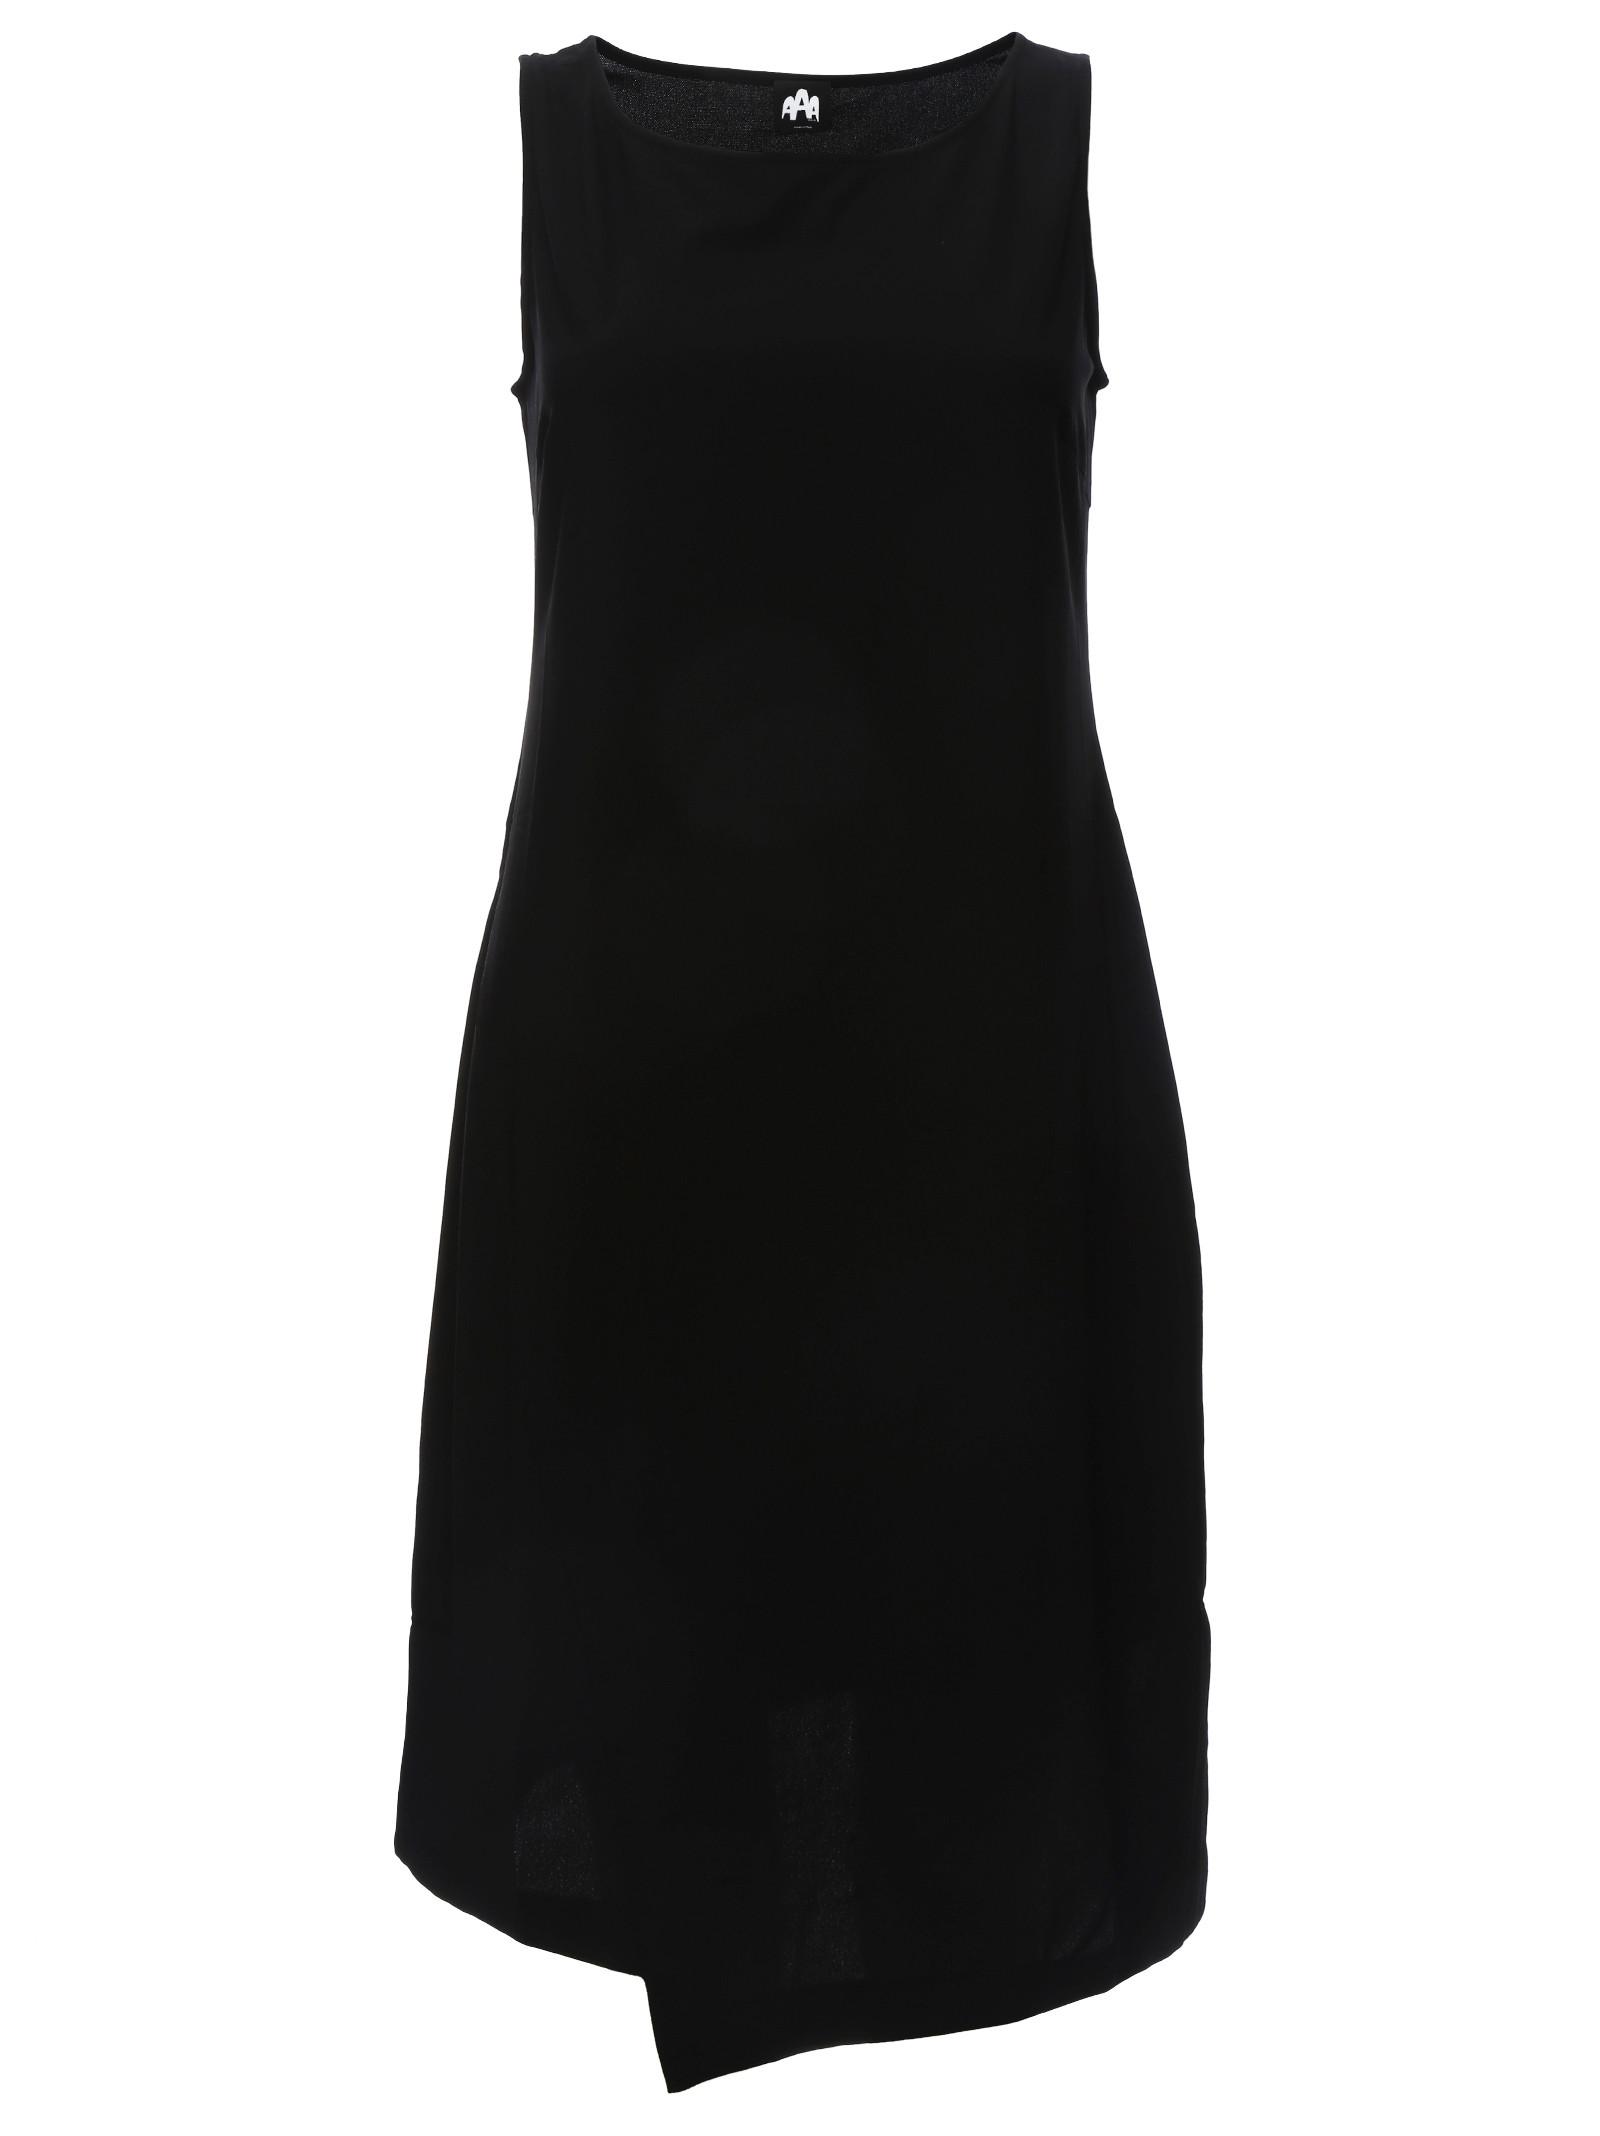 Viscose Stretch Sleeveless Dress